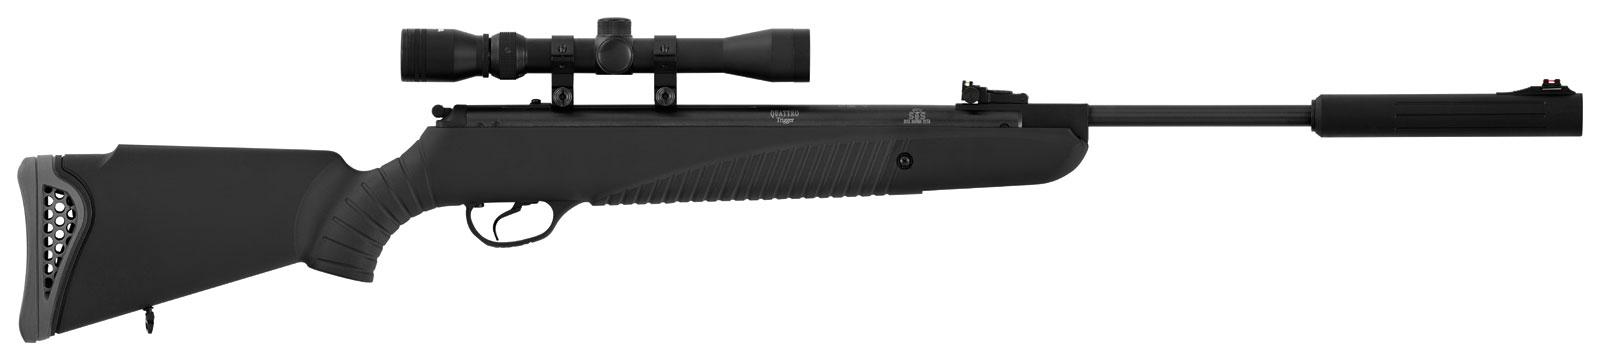 MOD 85 Sniper